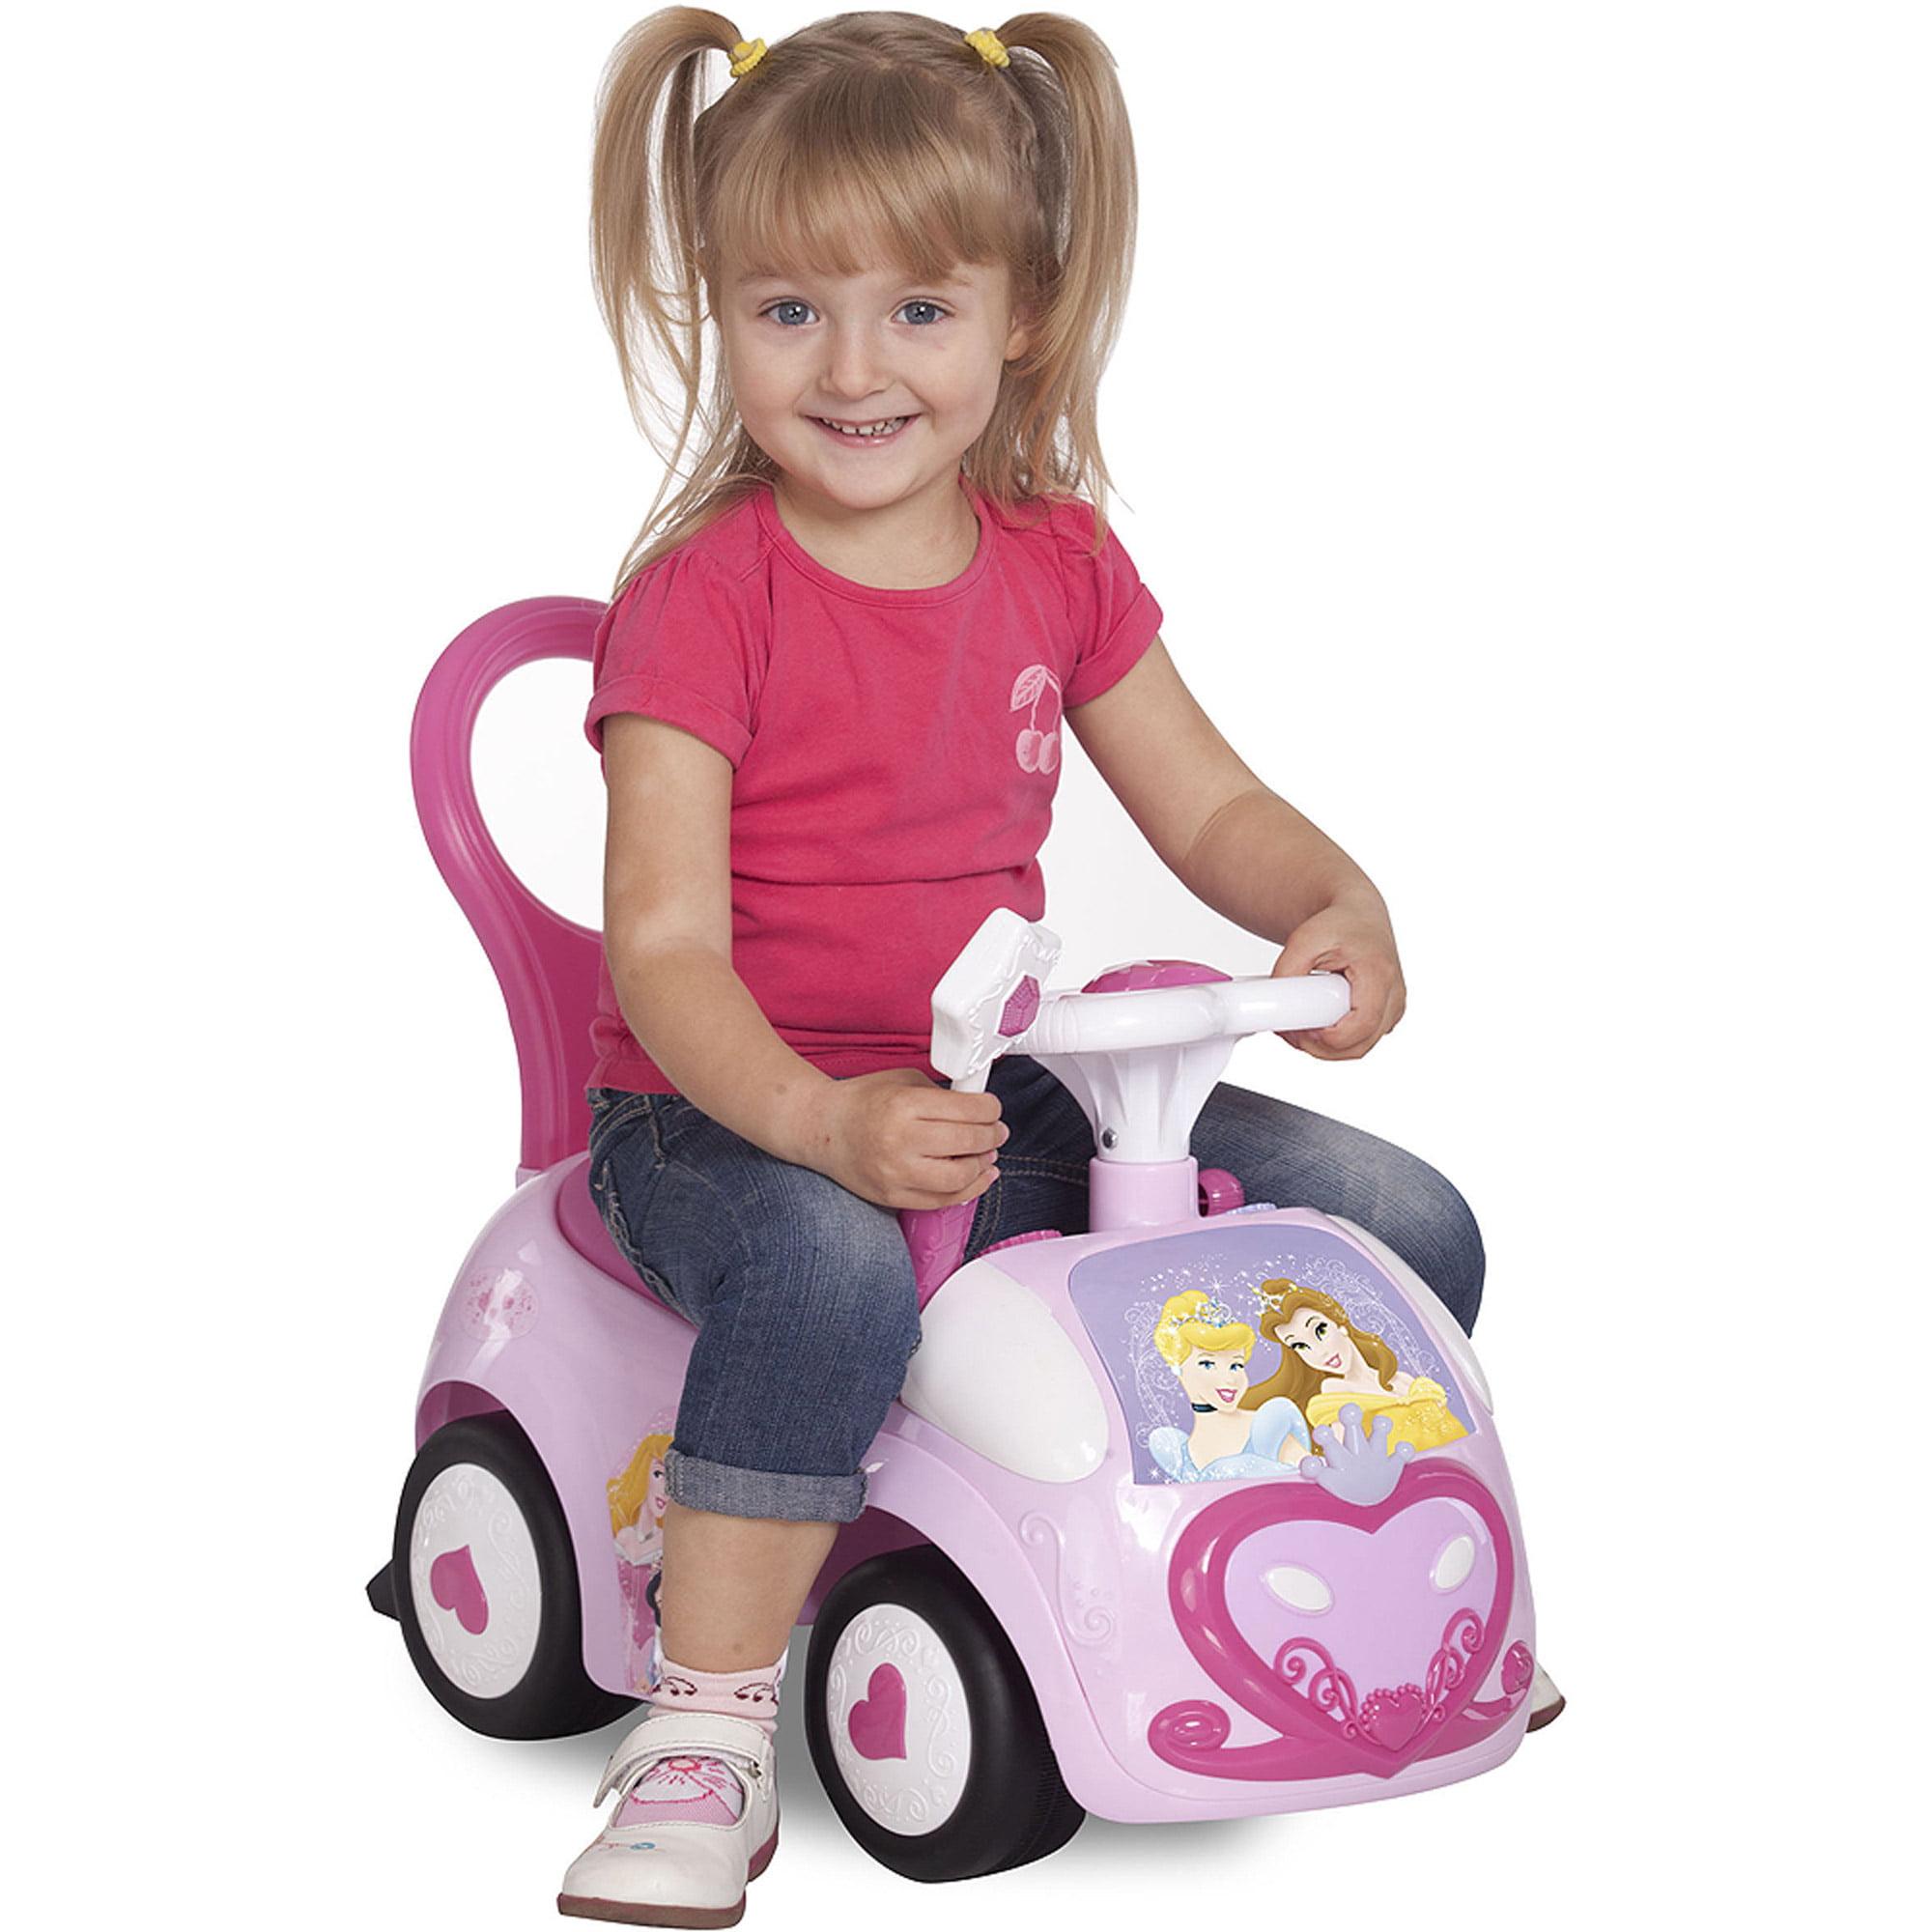 Kiddieland Disney Dancing Princess Activity Ride-On